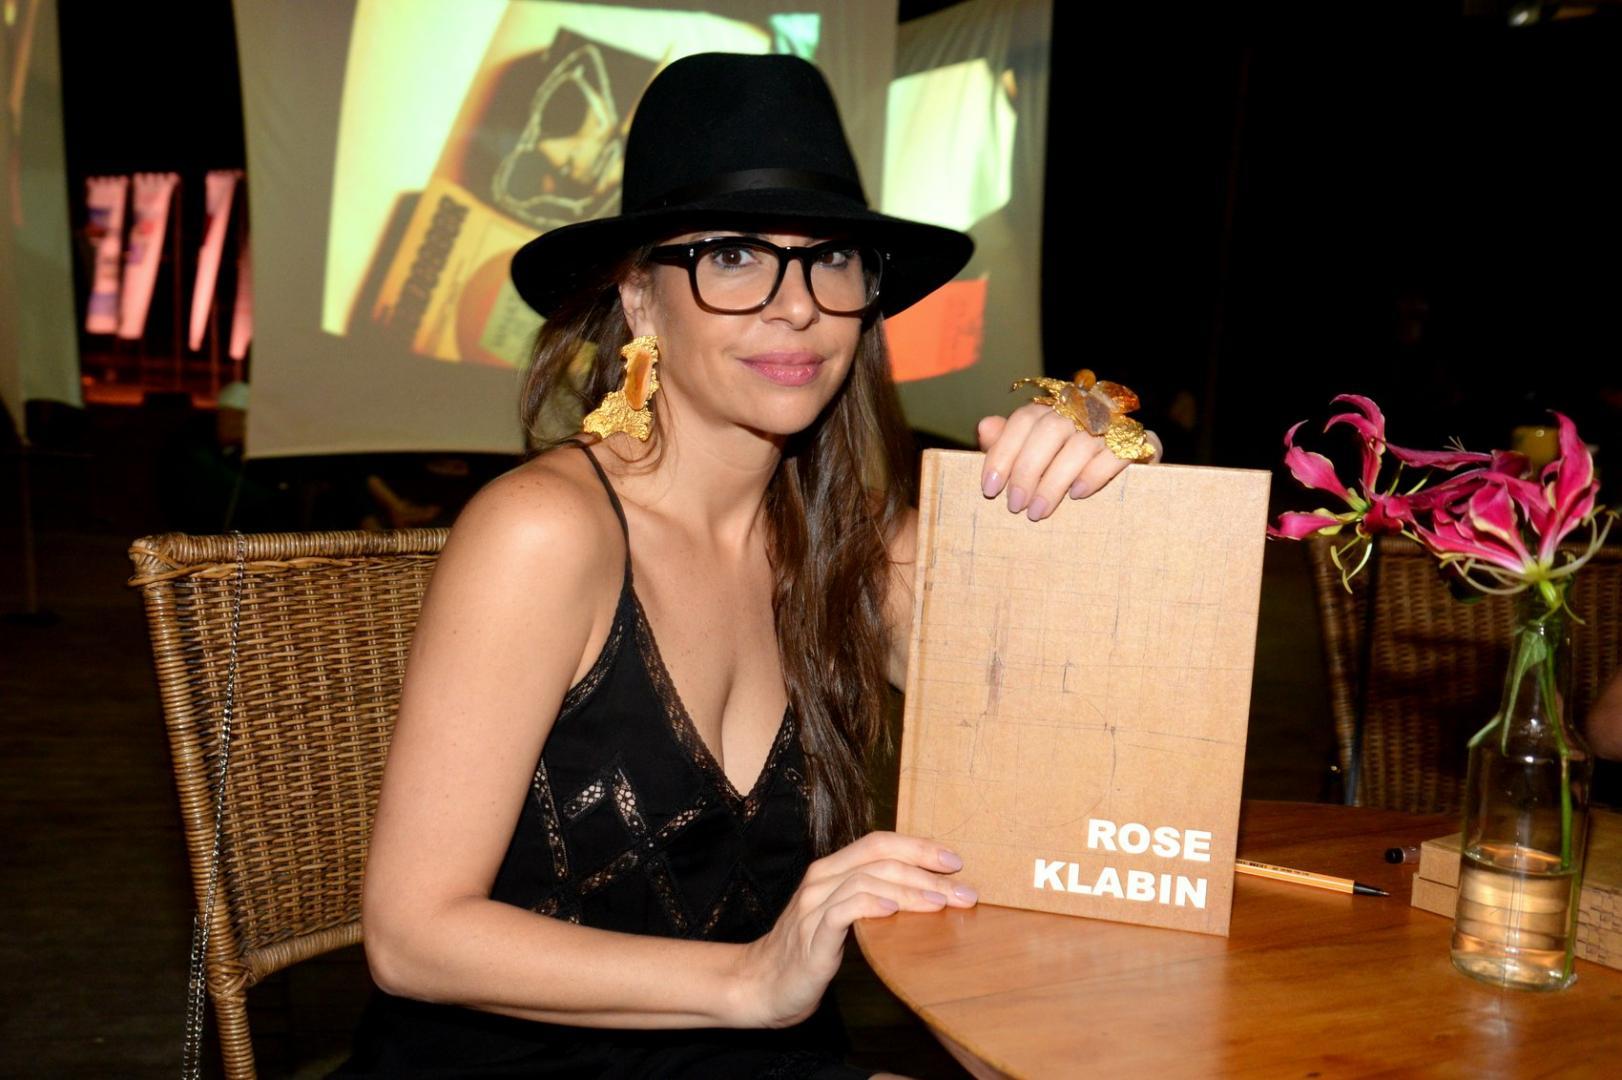 Rose Klabin lança livro na Art Rio 2019